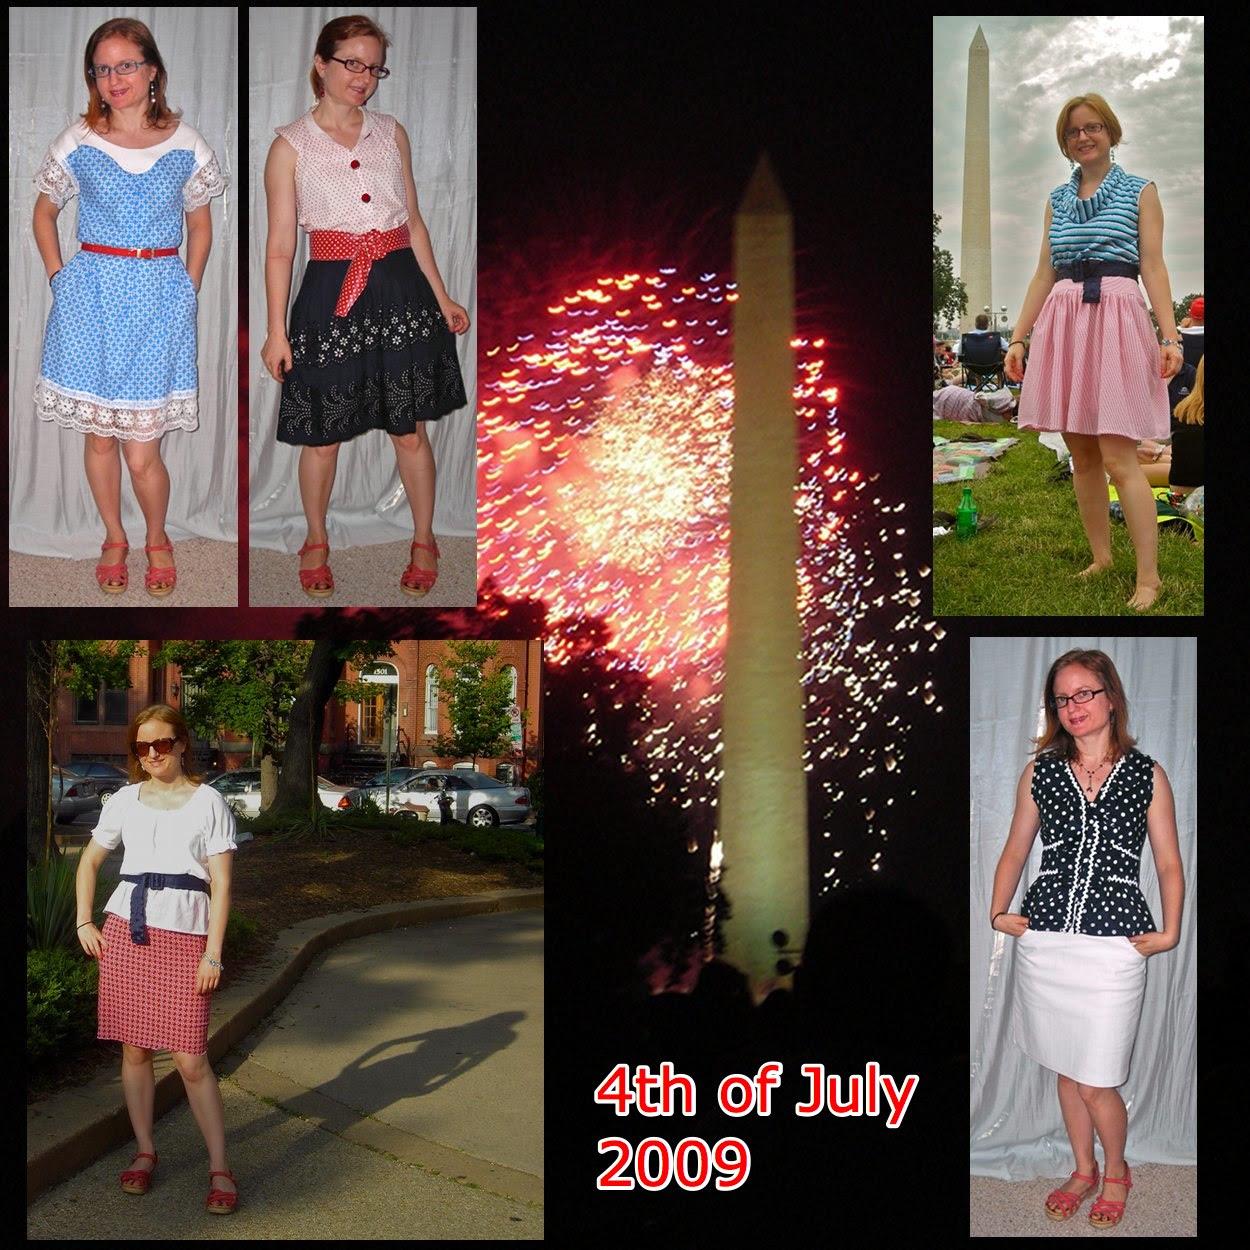 July 4th, 2009